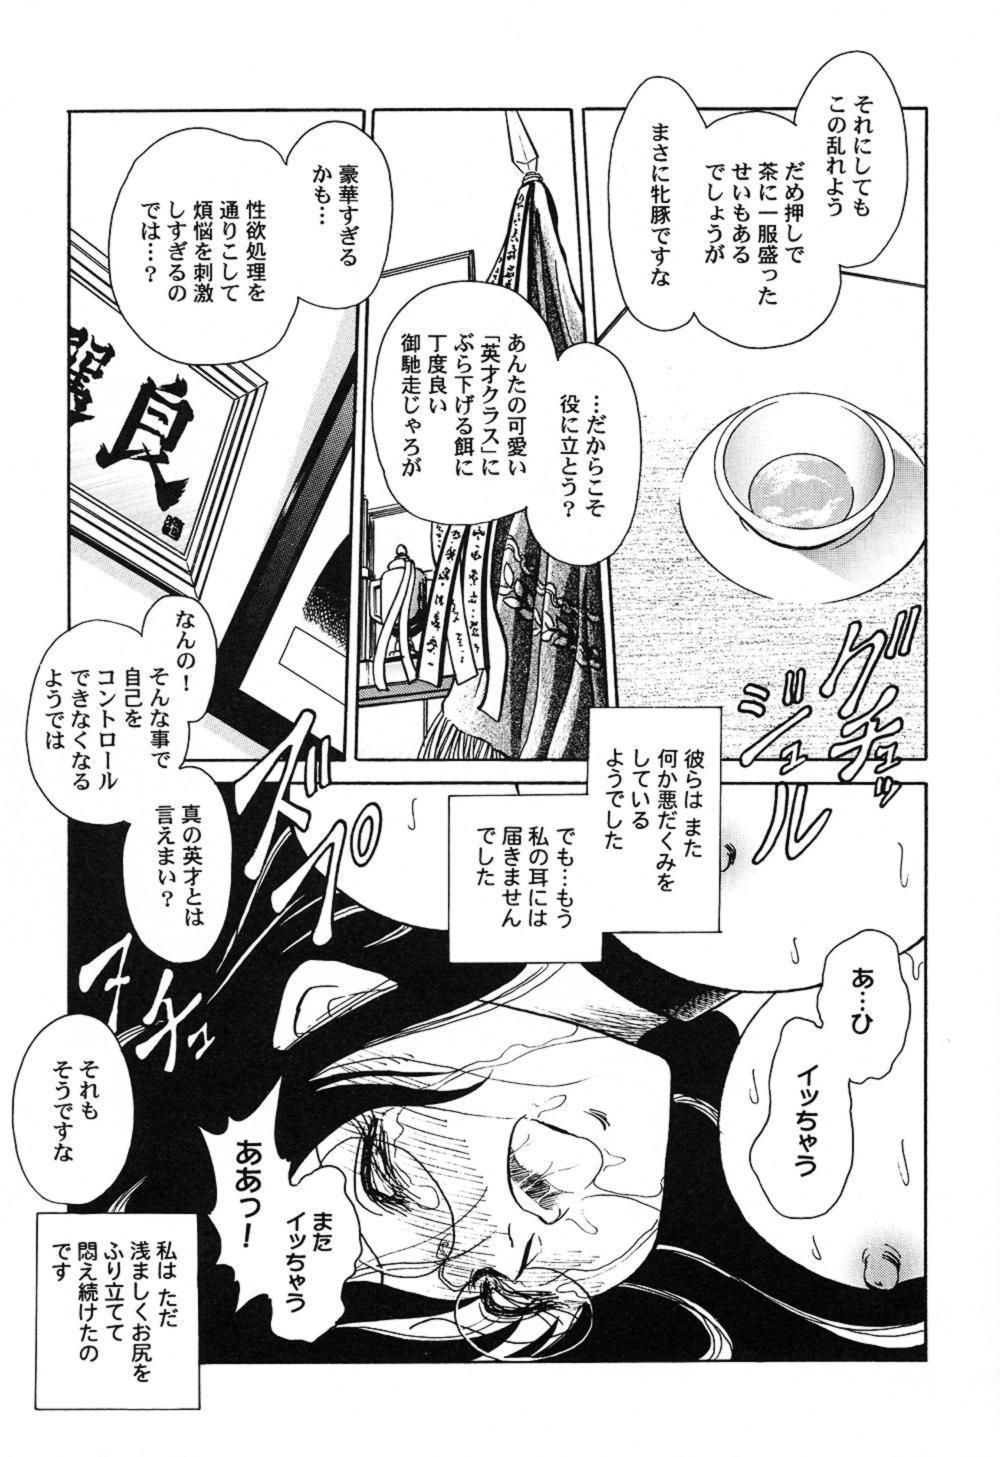 Hageshii Kagai Jugyou 177